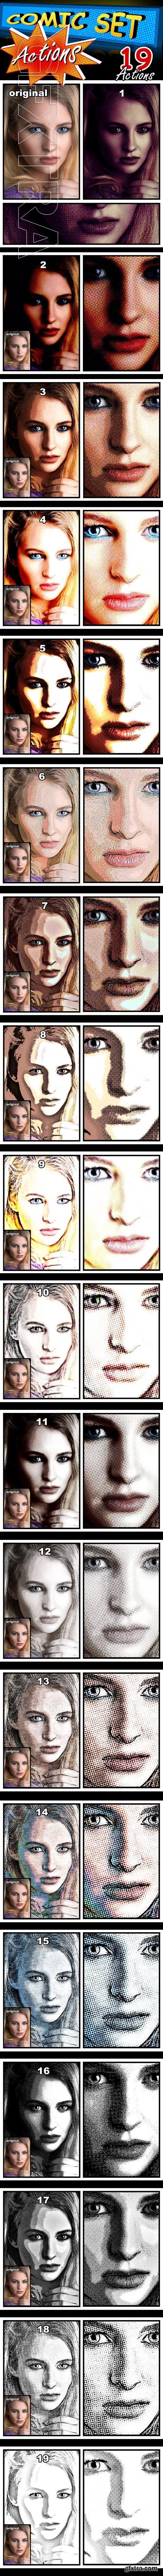 GraphicRiver - Comic Set Actions 22356377